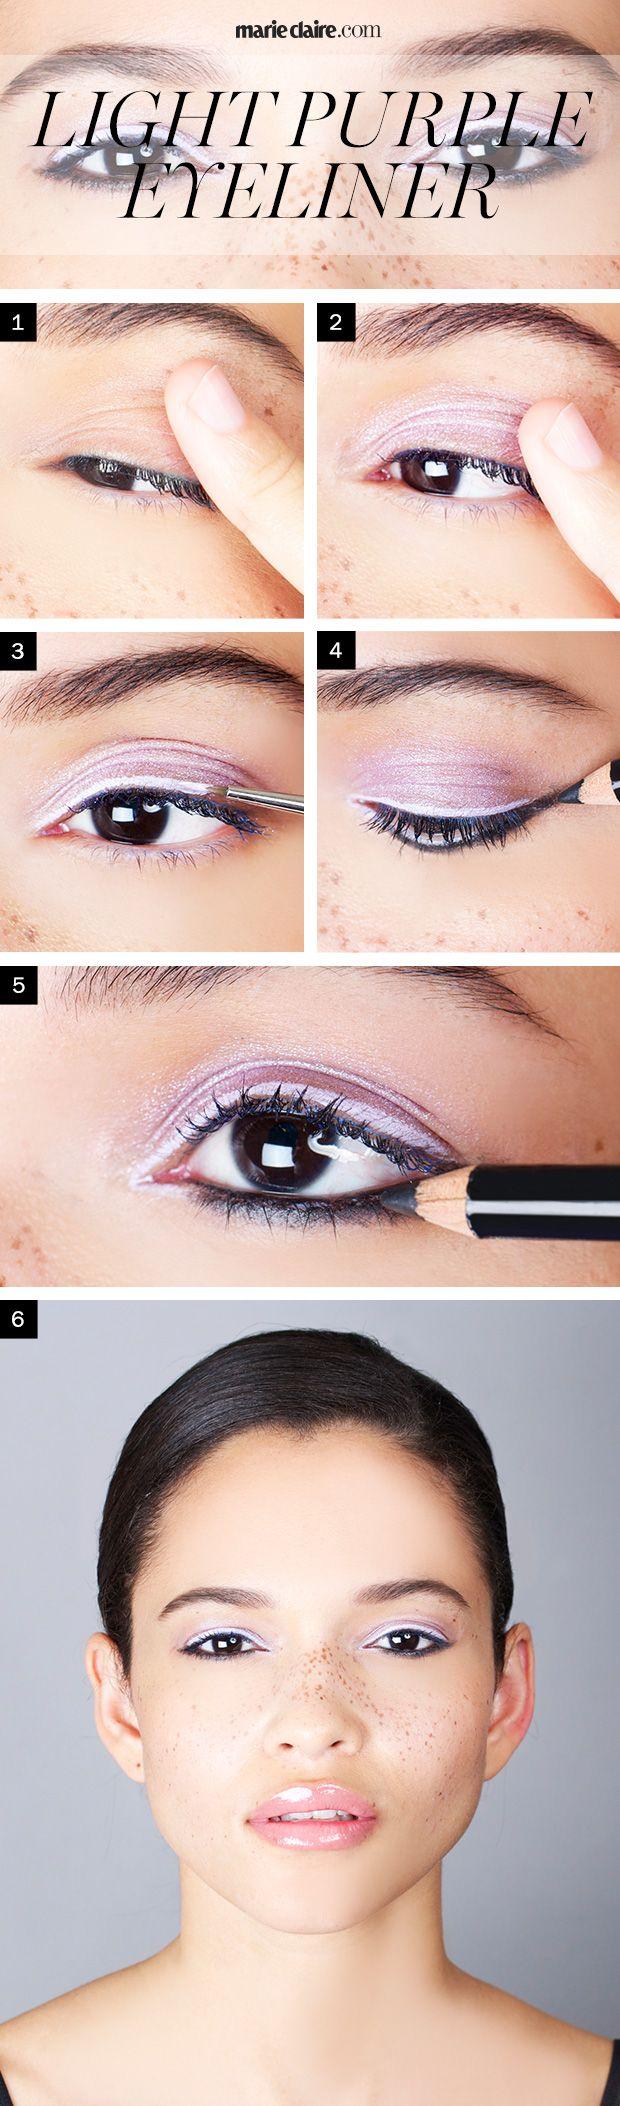 25+ best ideas about Best eyeliner on Pinterest | Best drugstore ...